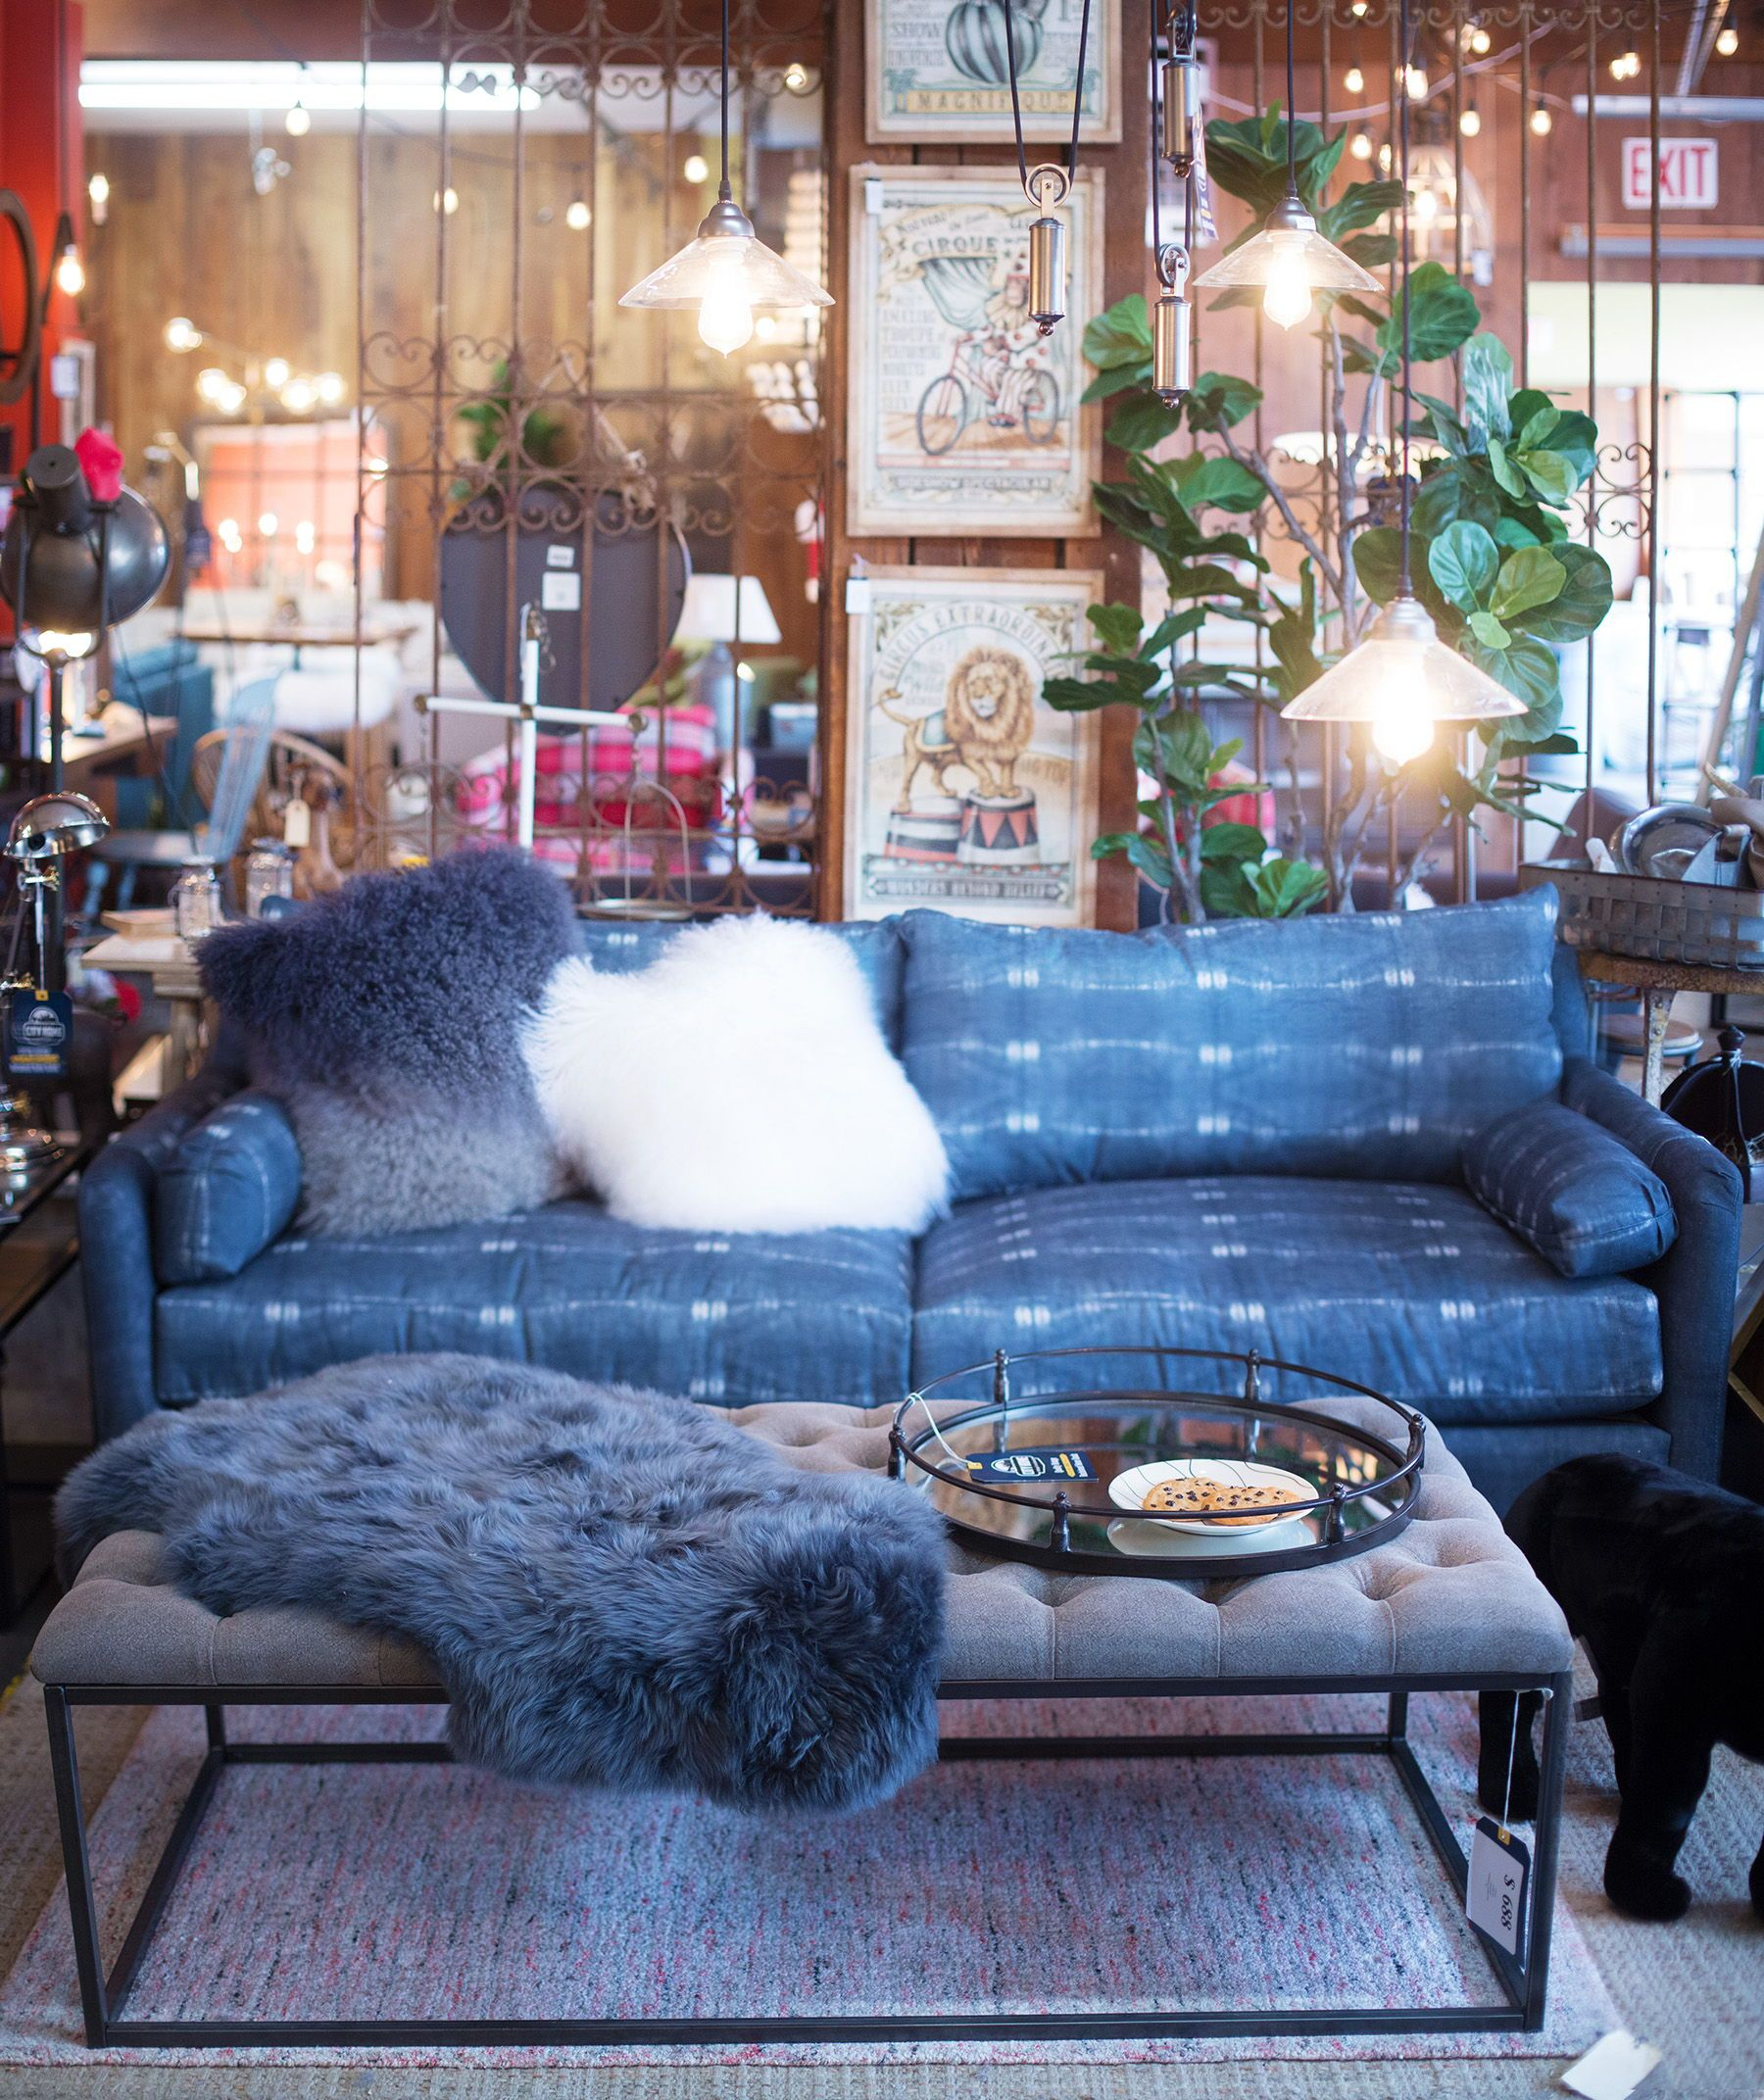 Sheepskin Accessories Blue Indigo Dye Sofa Home Decor Heaven At City Home In Portland Oregon Living Room Style Bright Pillows Home